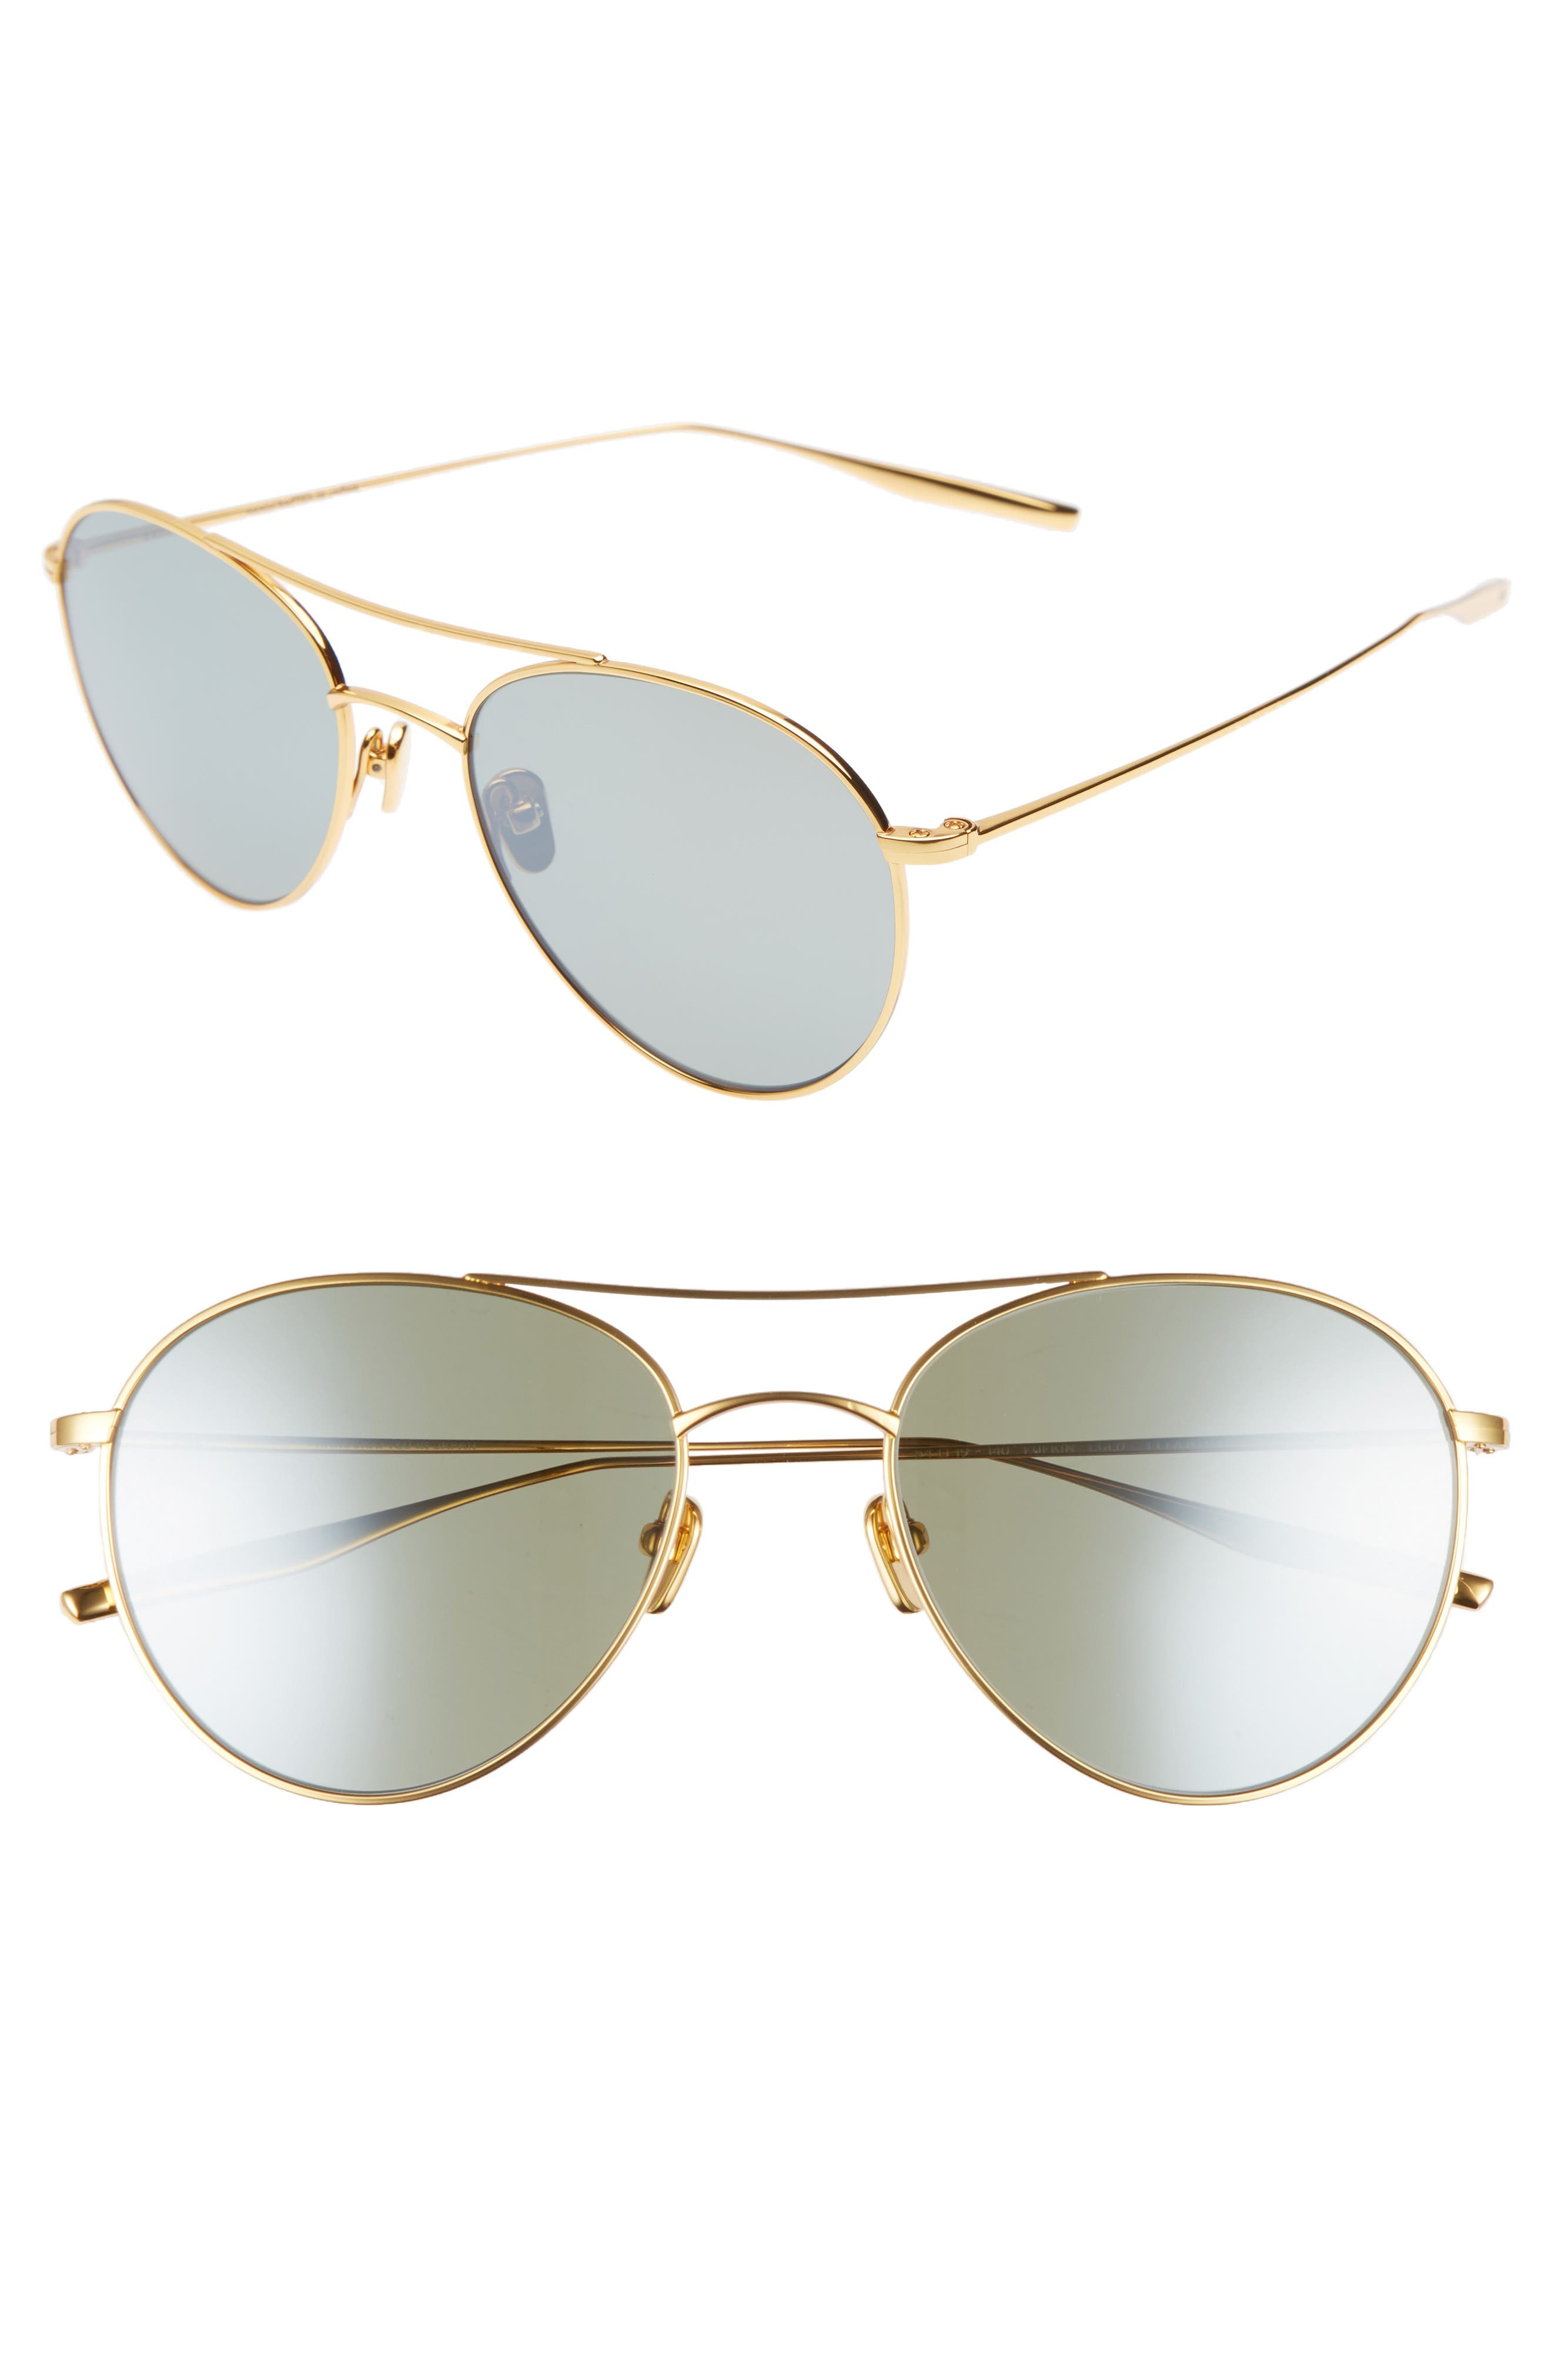 Main Image - Salt 54mm Polarized Round Sunglasses